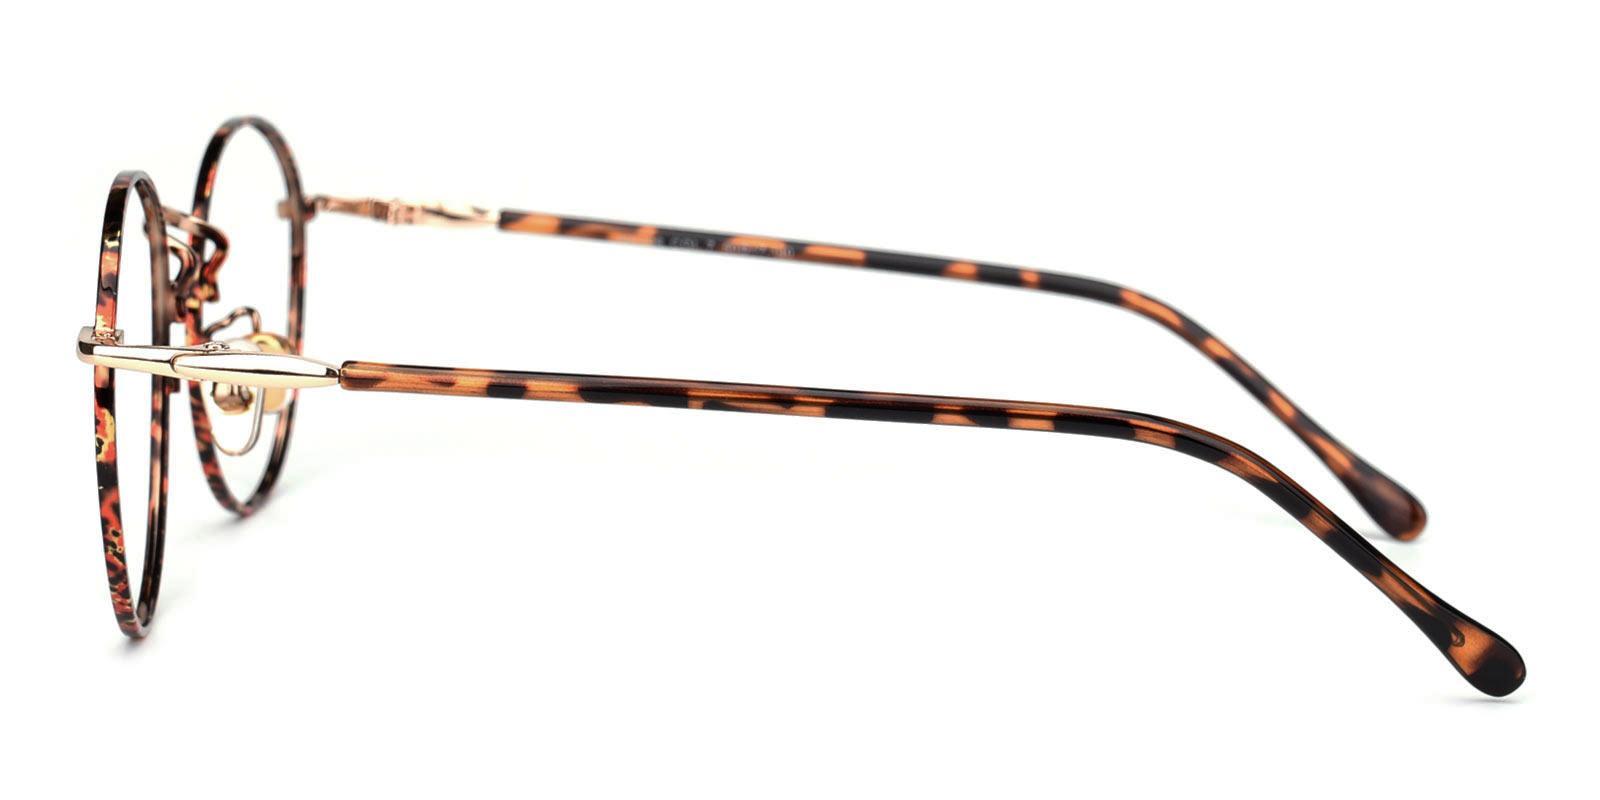 Donuts-Tortoise-Round-Metal-Eyeglasses-detail